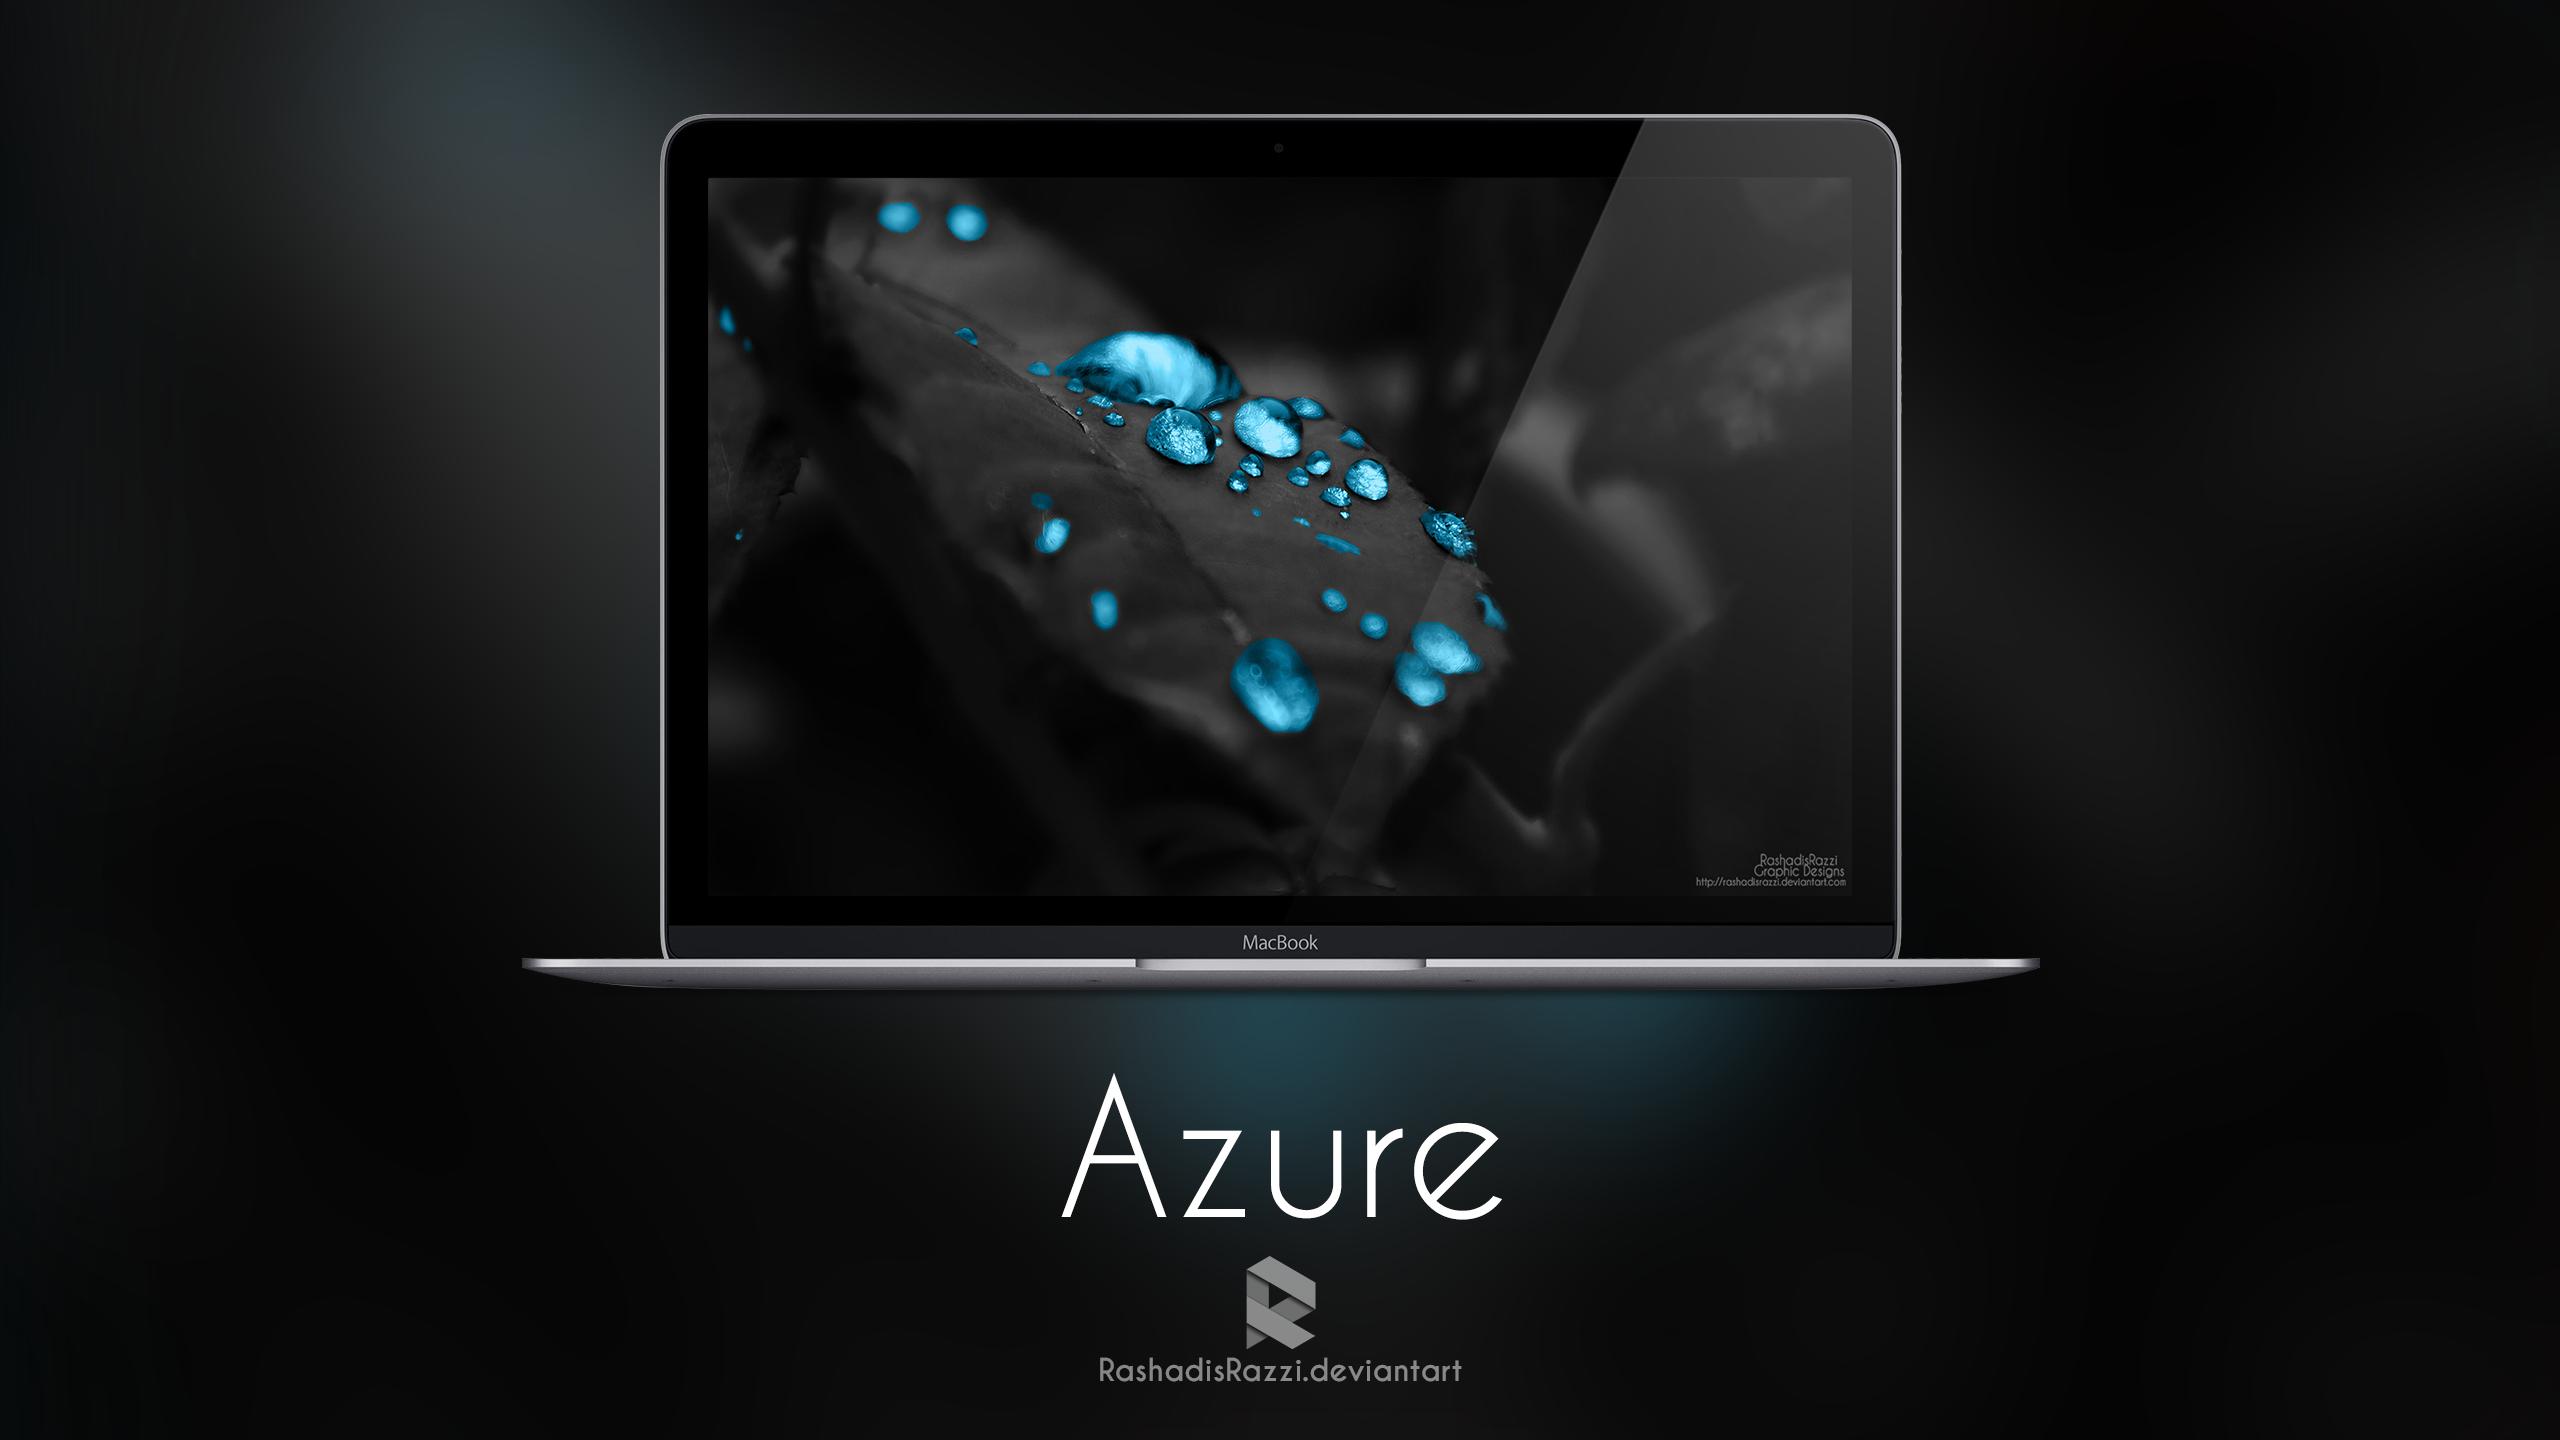 Azure by rashadisrazzi